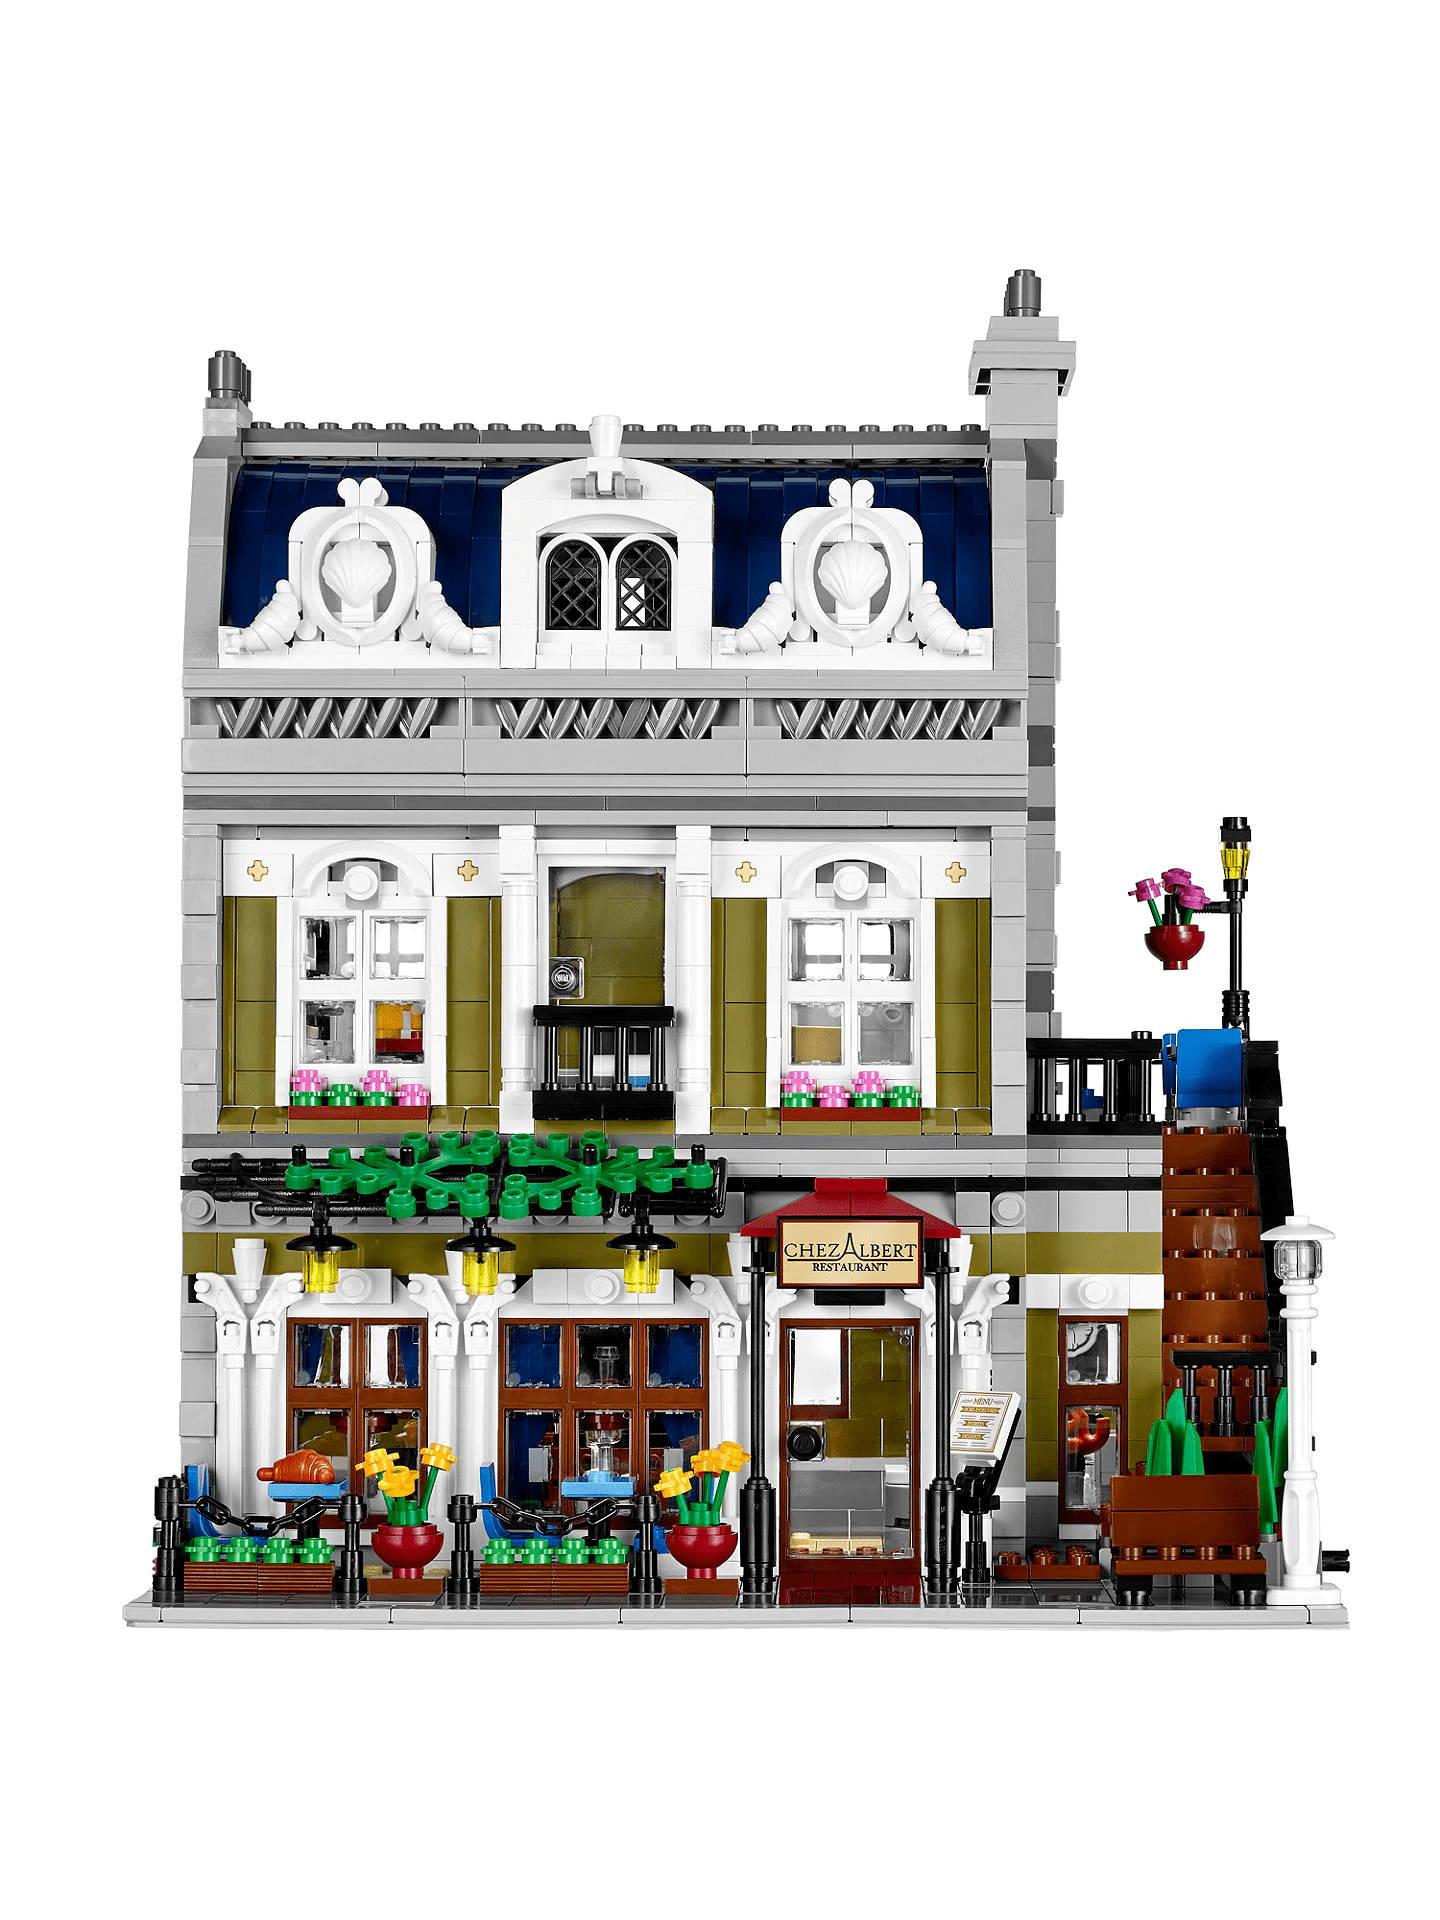 LEGO PARISIAN RESTAURANT10243